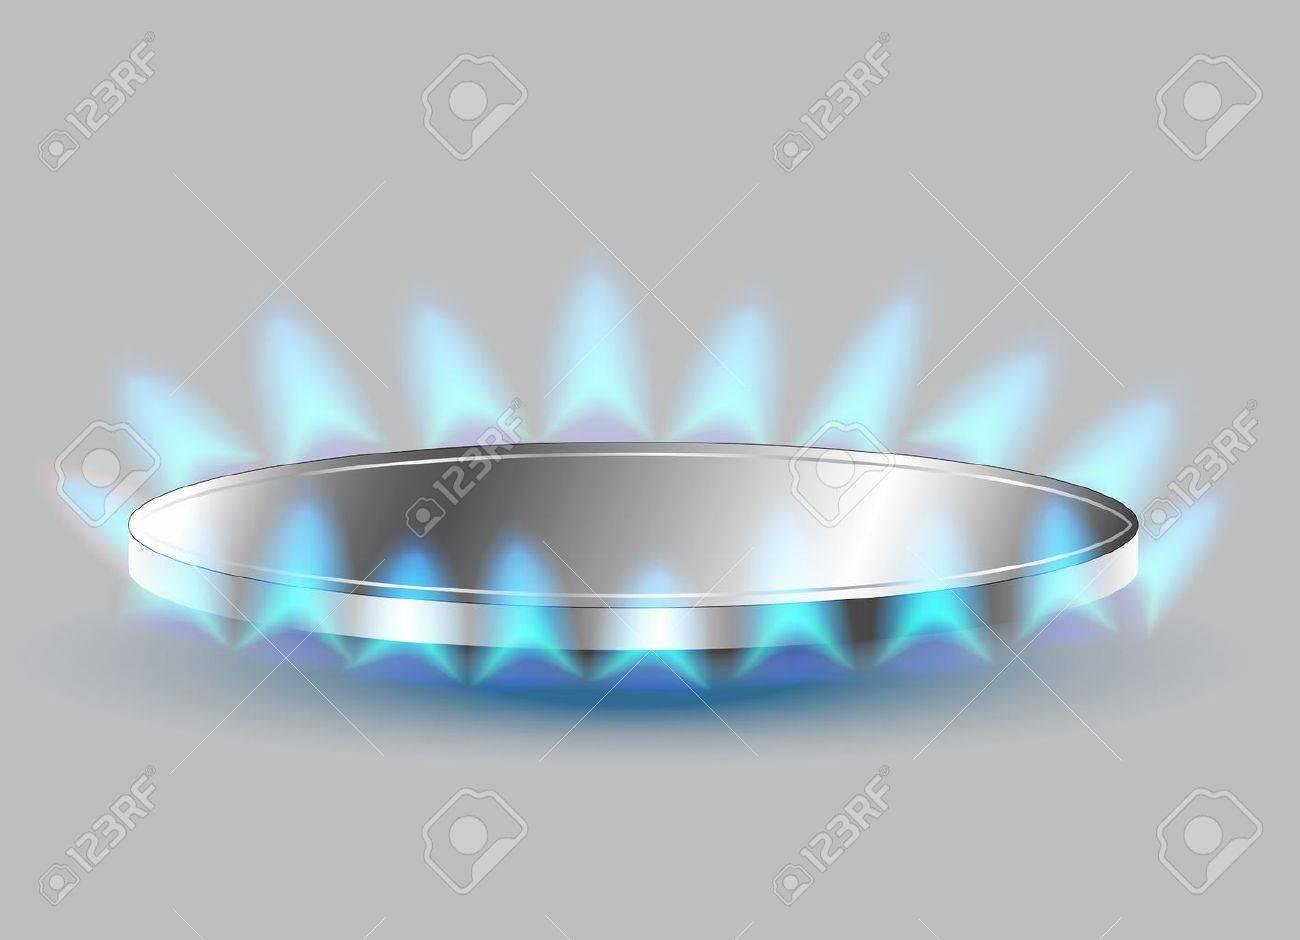 Gas stove burner illustration Stock Vector - 19413938